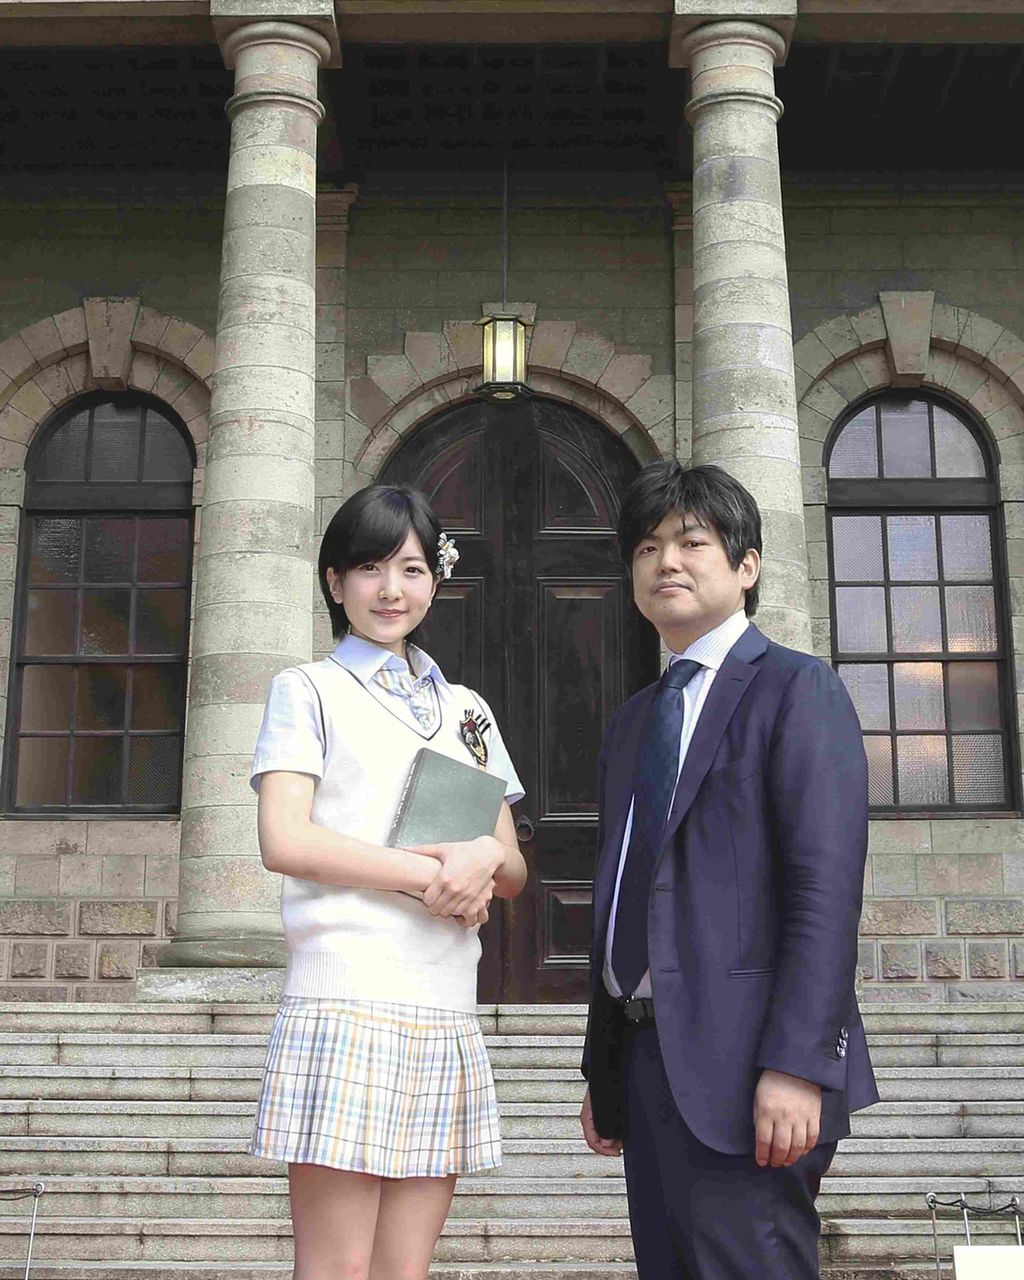 NMB48須藤凜々花が読売新聞夕刊で瀧本哲史(京大准教授)と対談